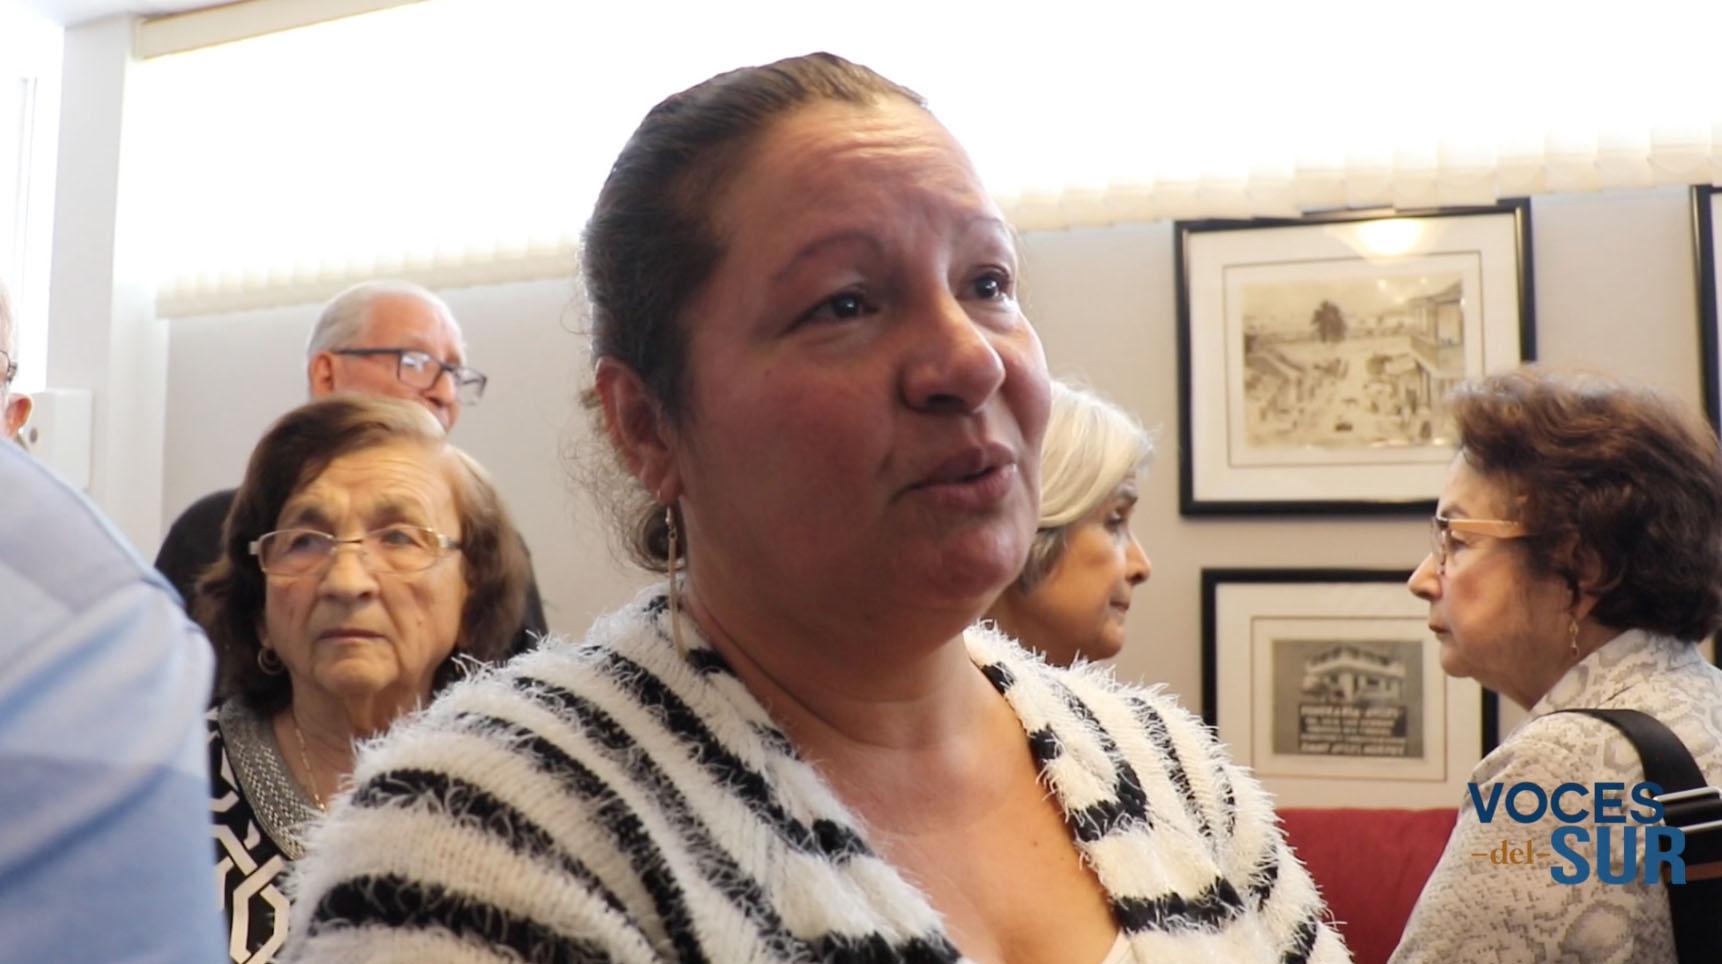 Zaida Ojeda Pérez, madre de Valerie Ann Almodóvar Ojeda. (Voces del Sur / Michelle Estrada Torres)